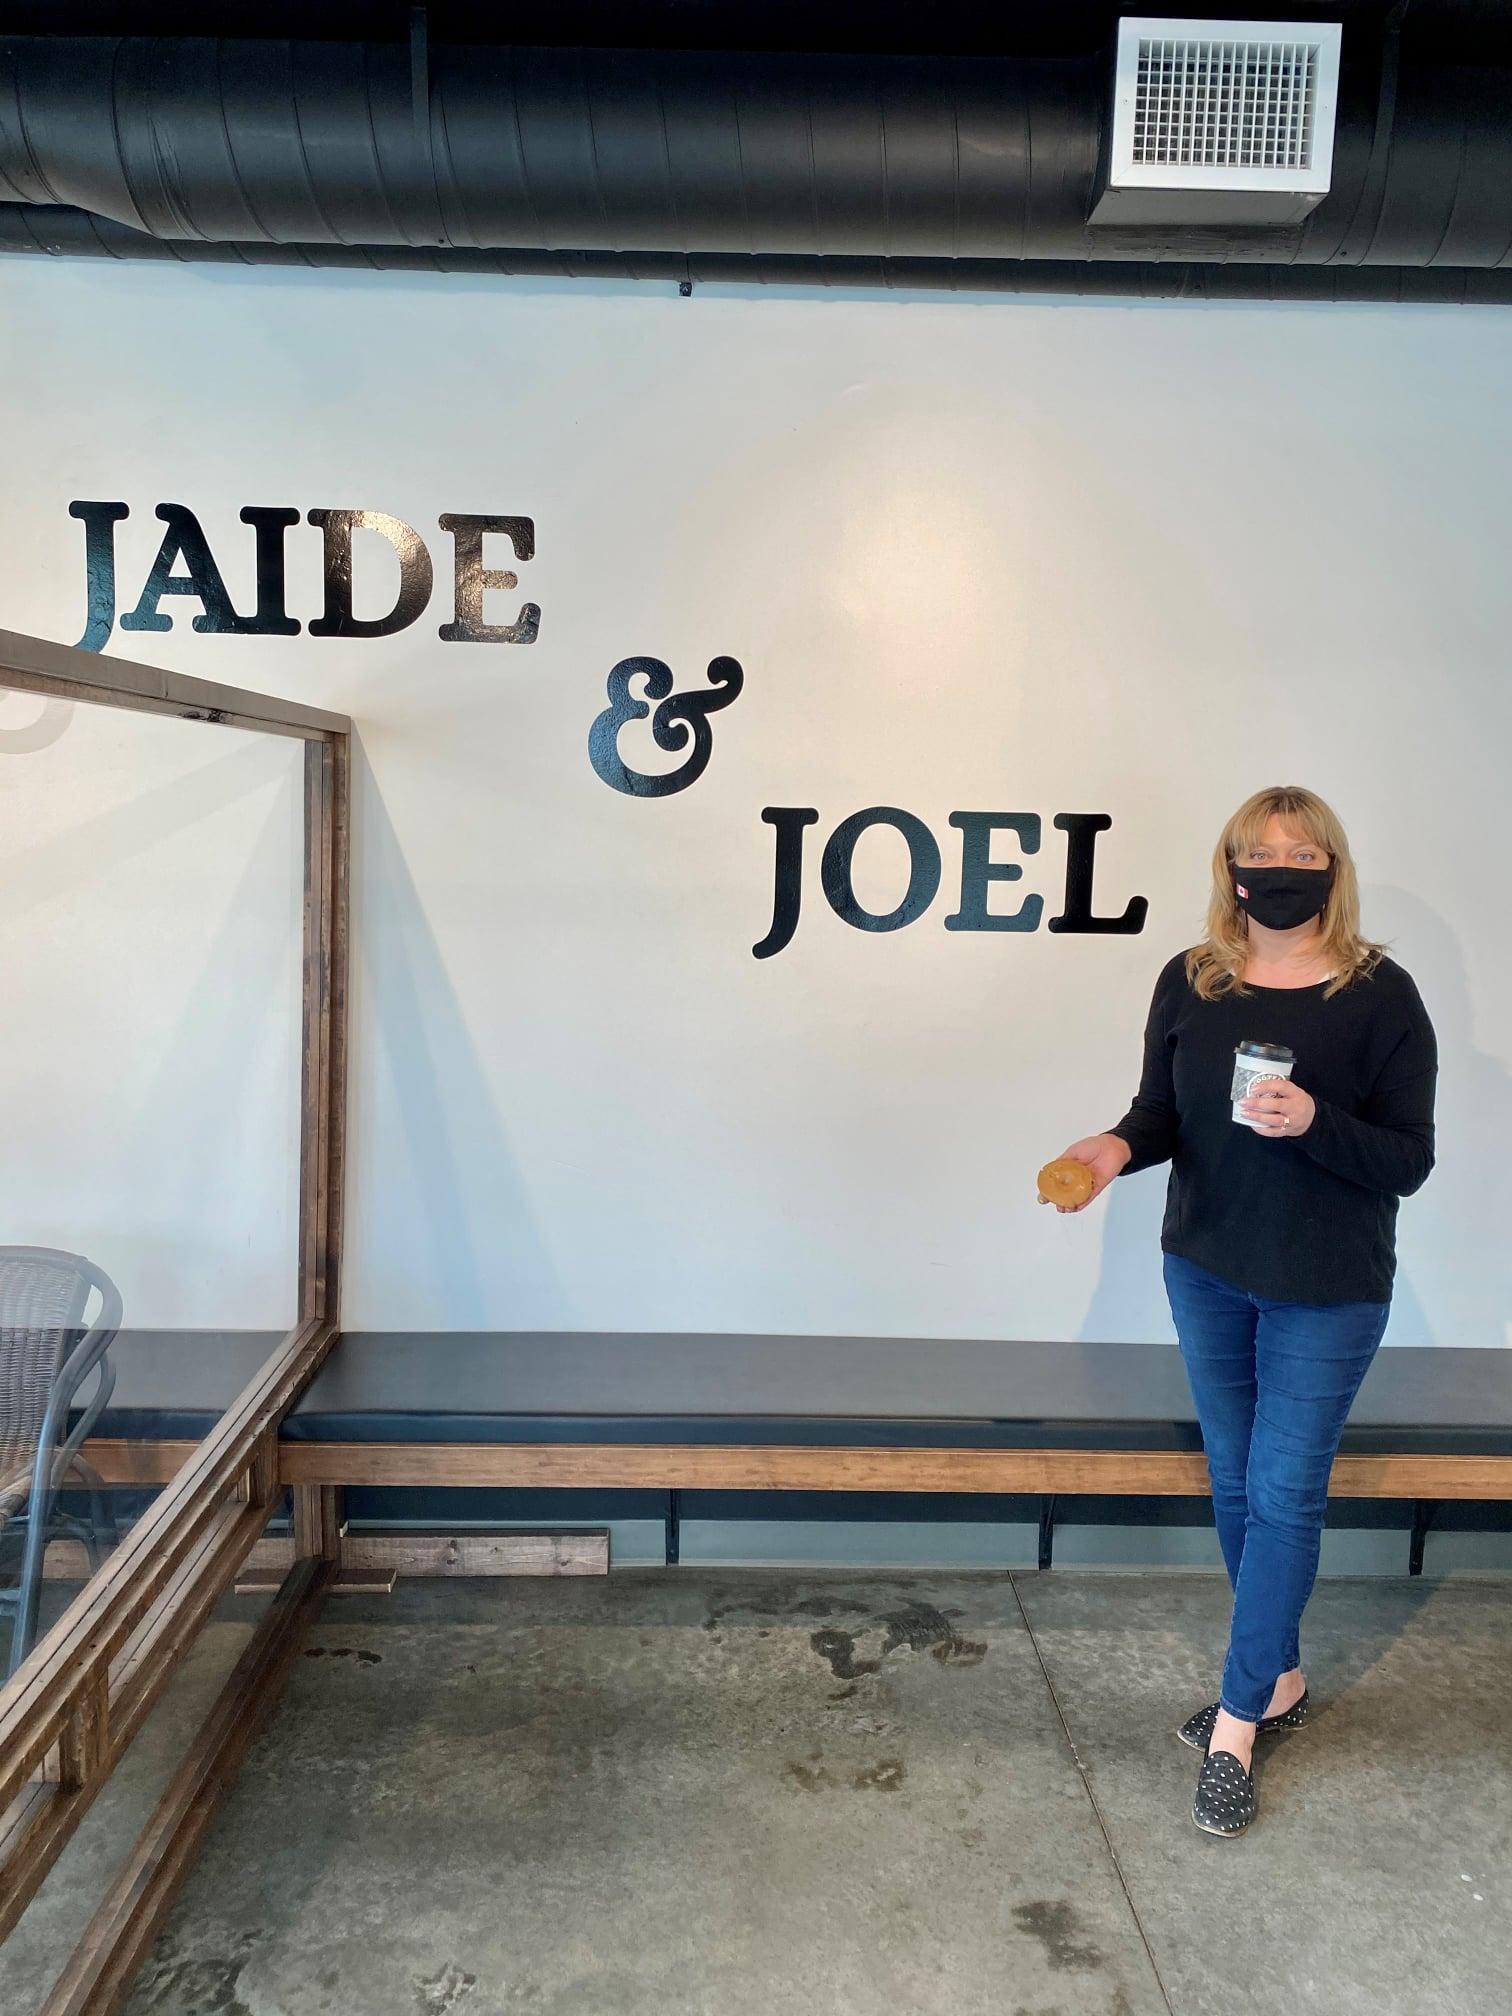 Small Business Spotlight: Jaide & Joel's Baking Co